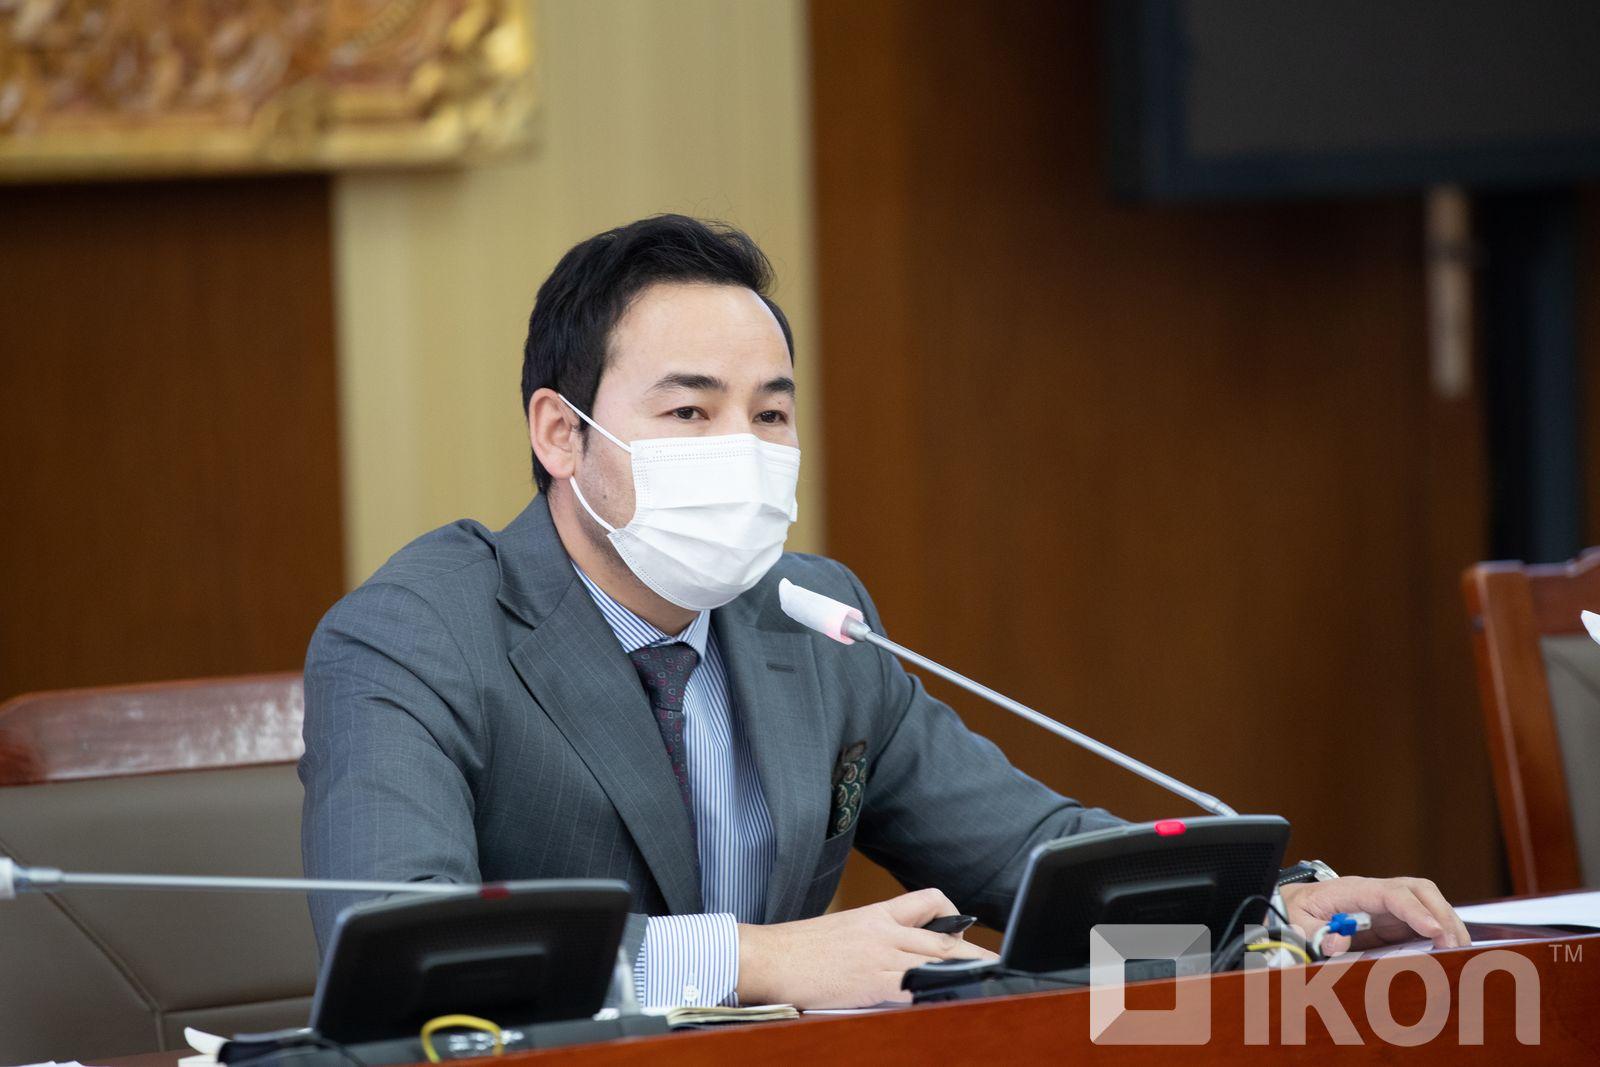 Ts.Ganzorig 대변인, 중국제 시노팜 백신이 오늘 22시에 몽골에 도착할 것.jpg